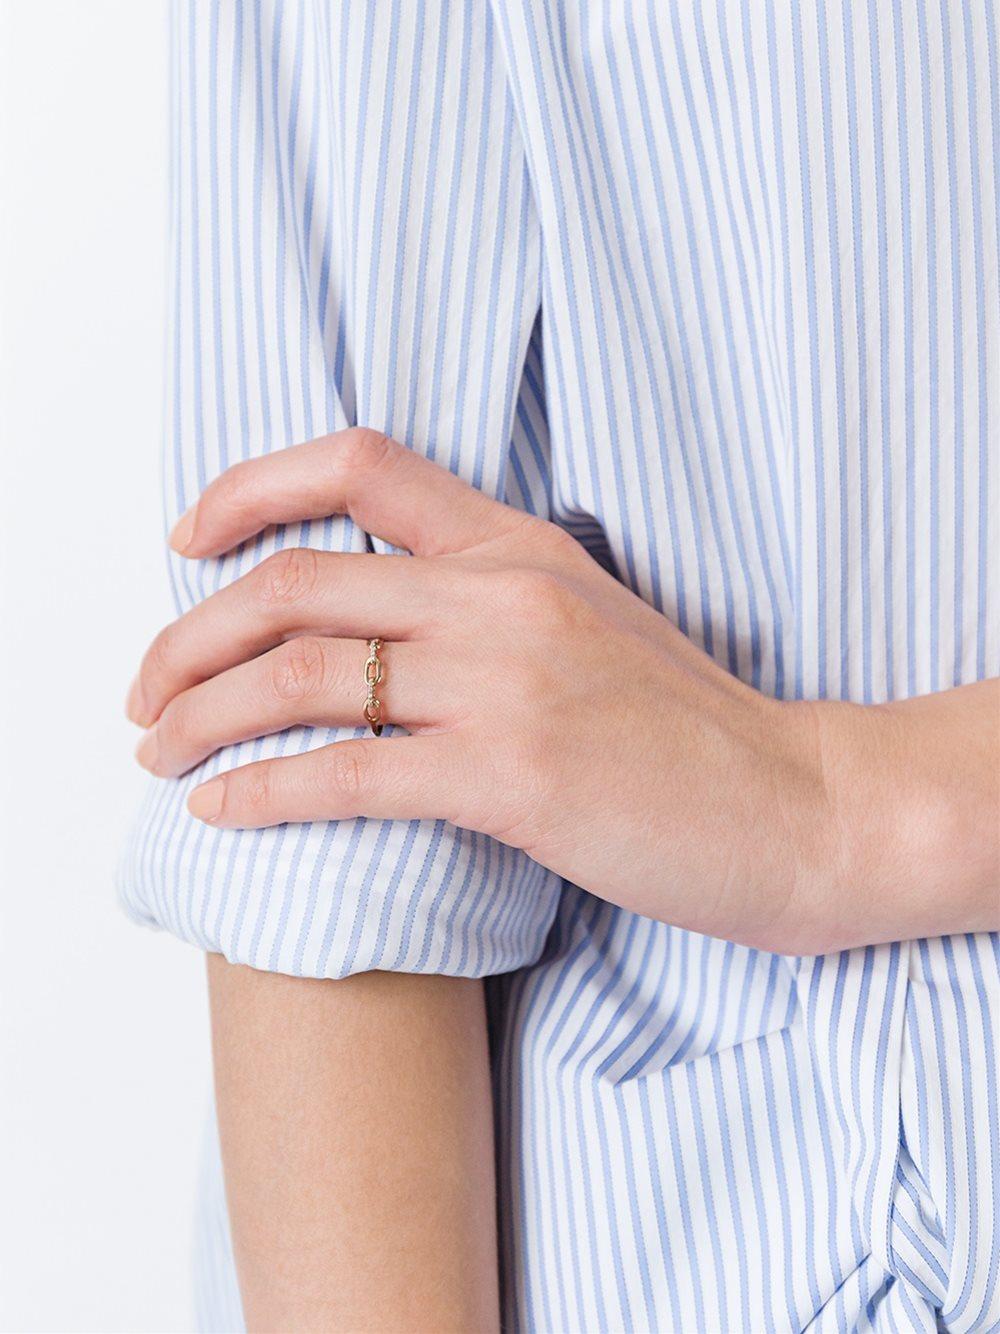 Tilda Biehn 'aurora' Ring in Metallic